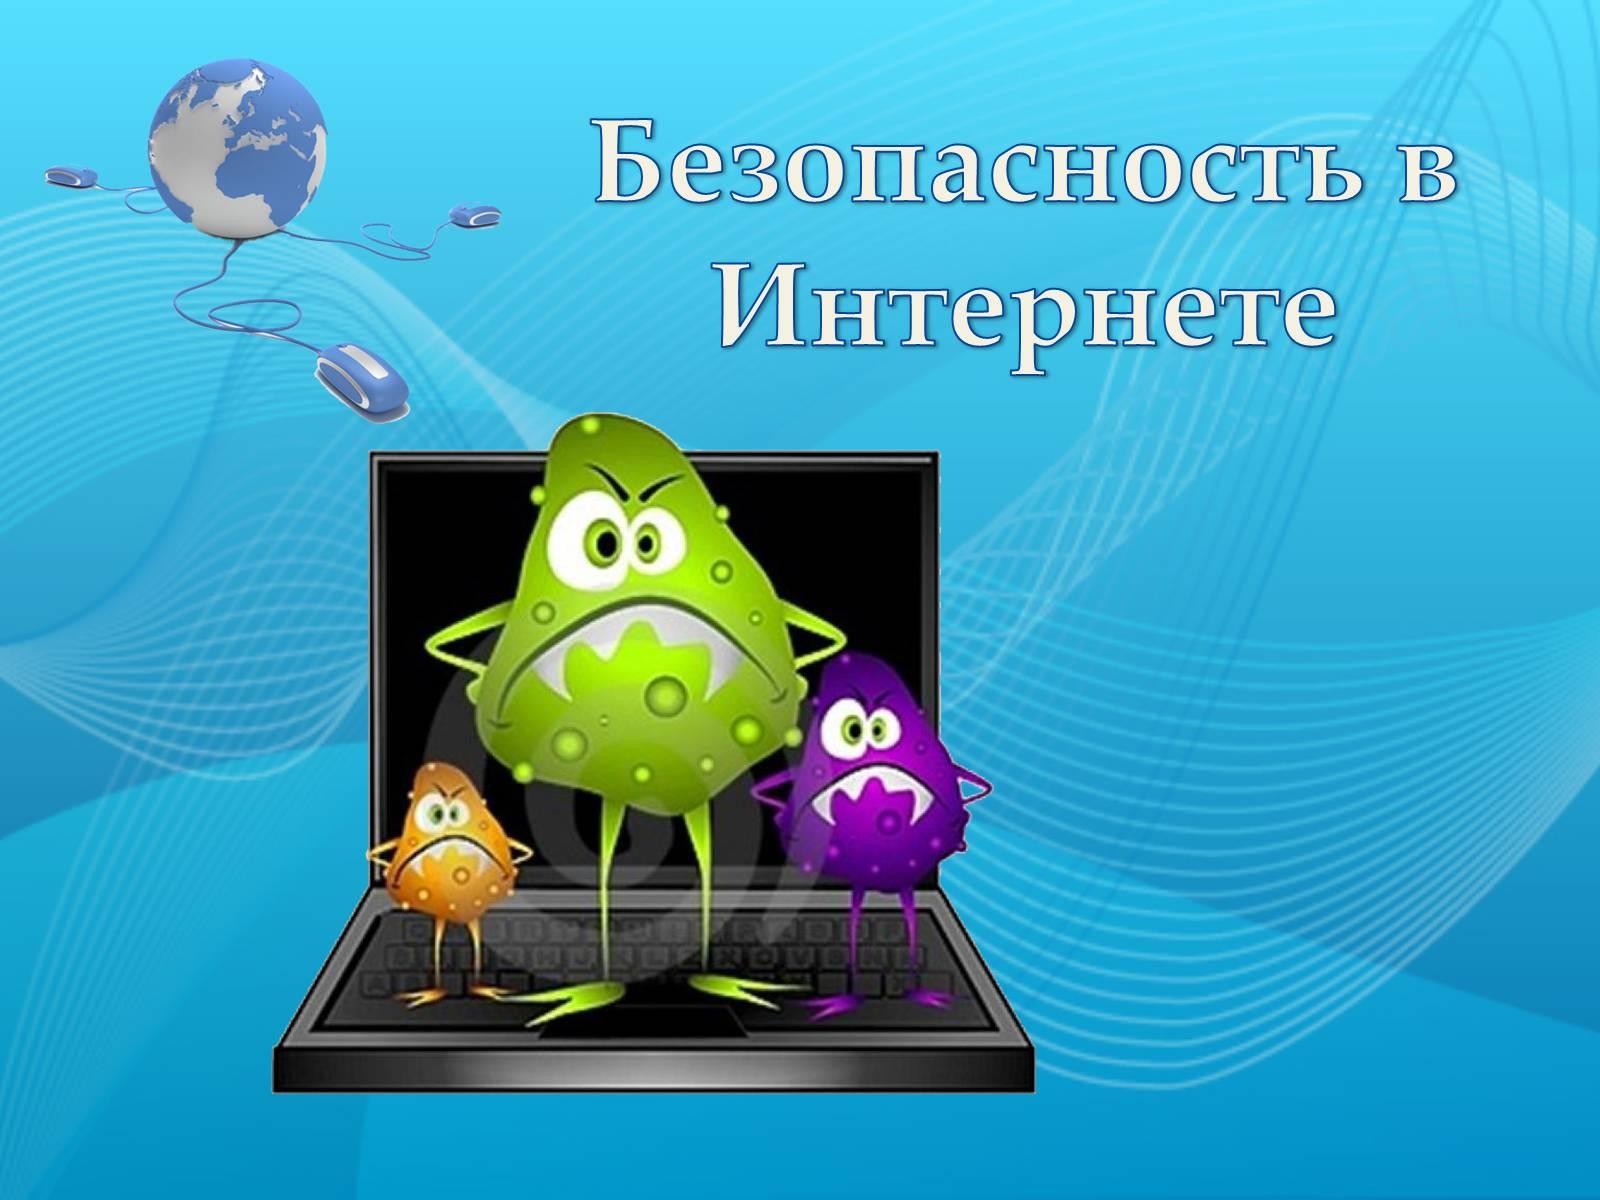 Картинка о безопасности в интернете